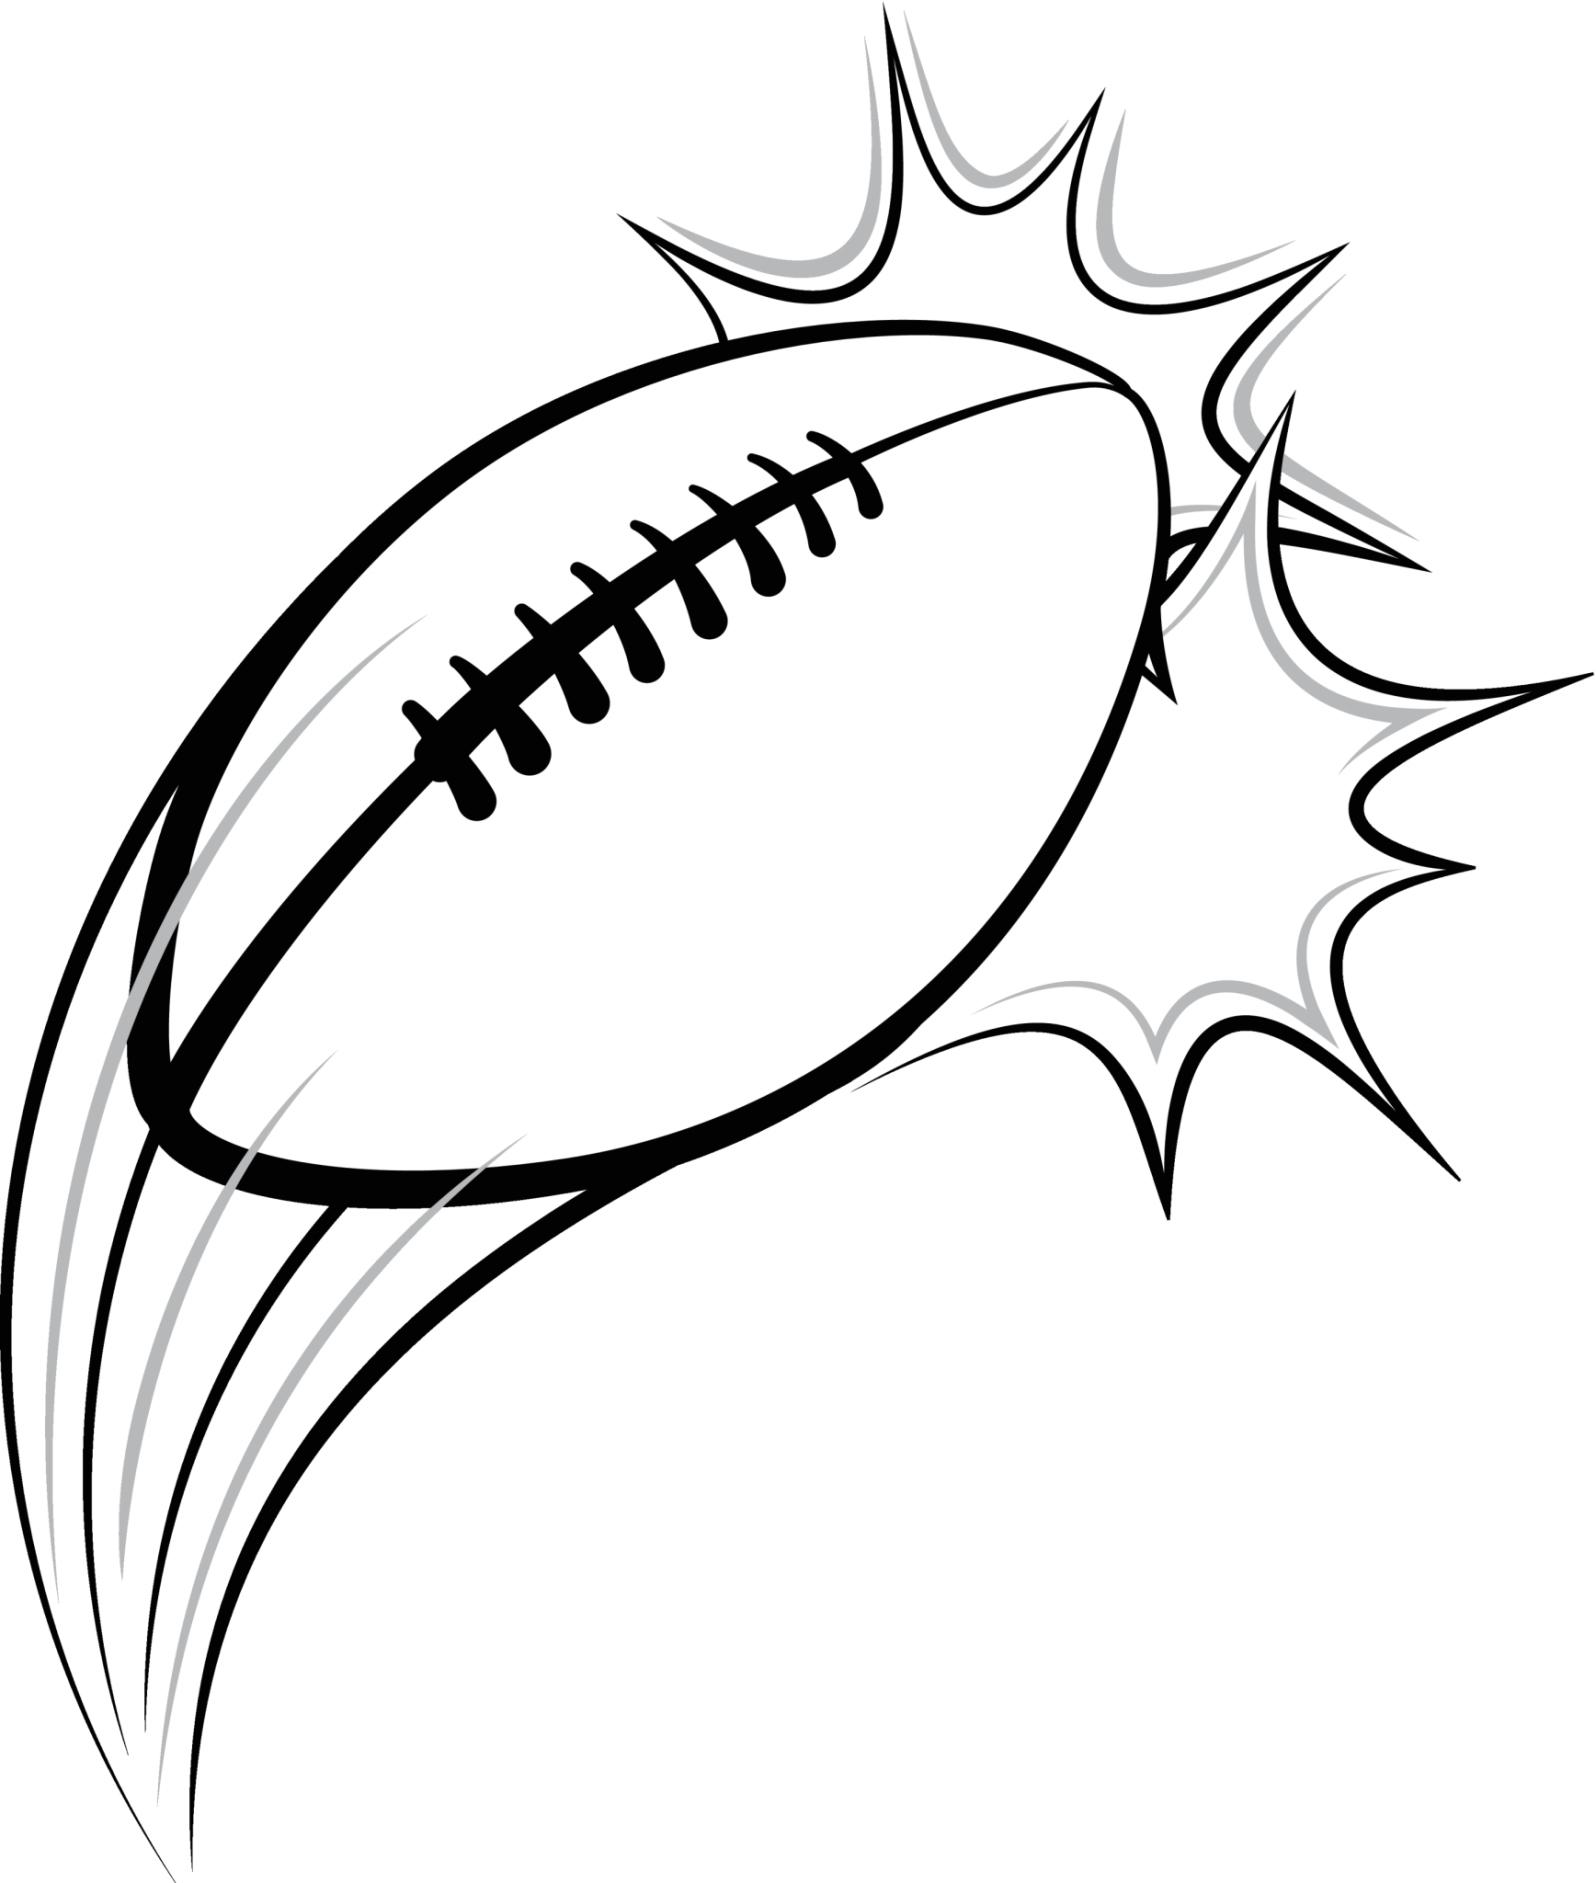 Drawing Of Football